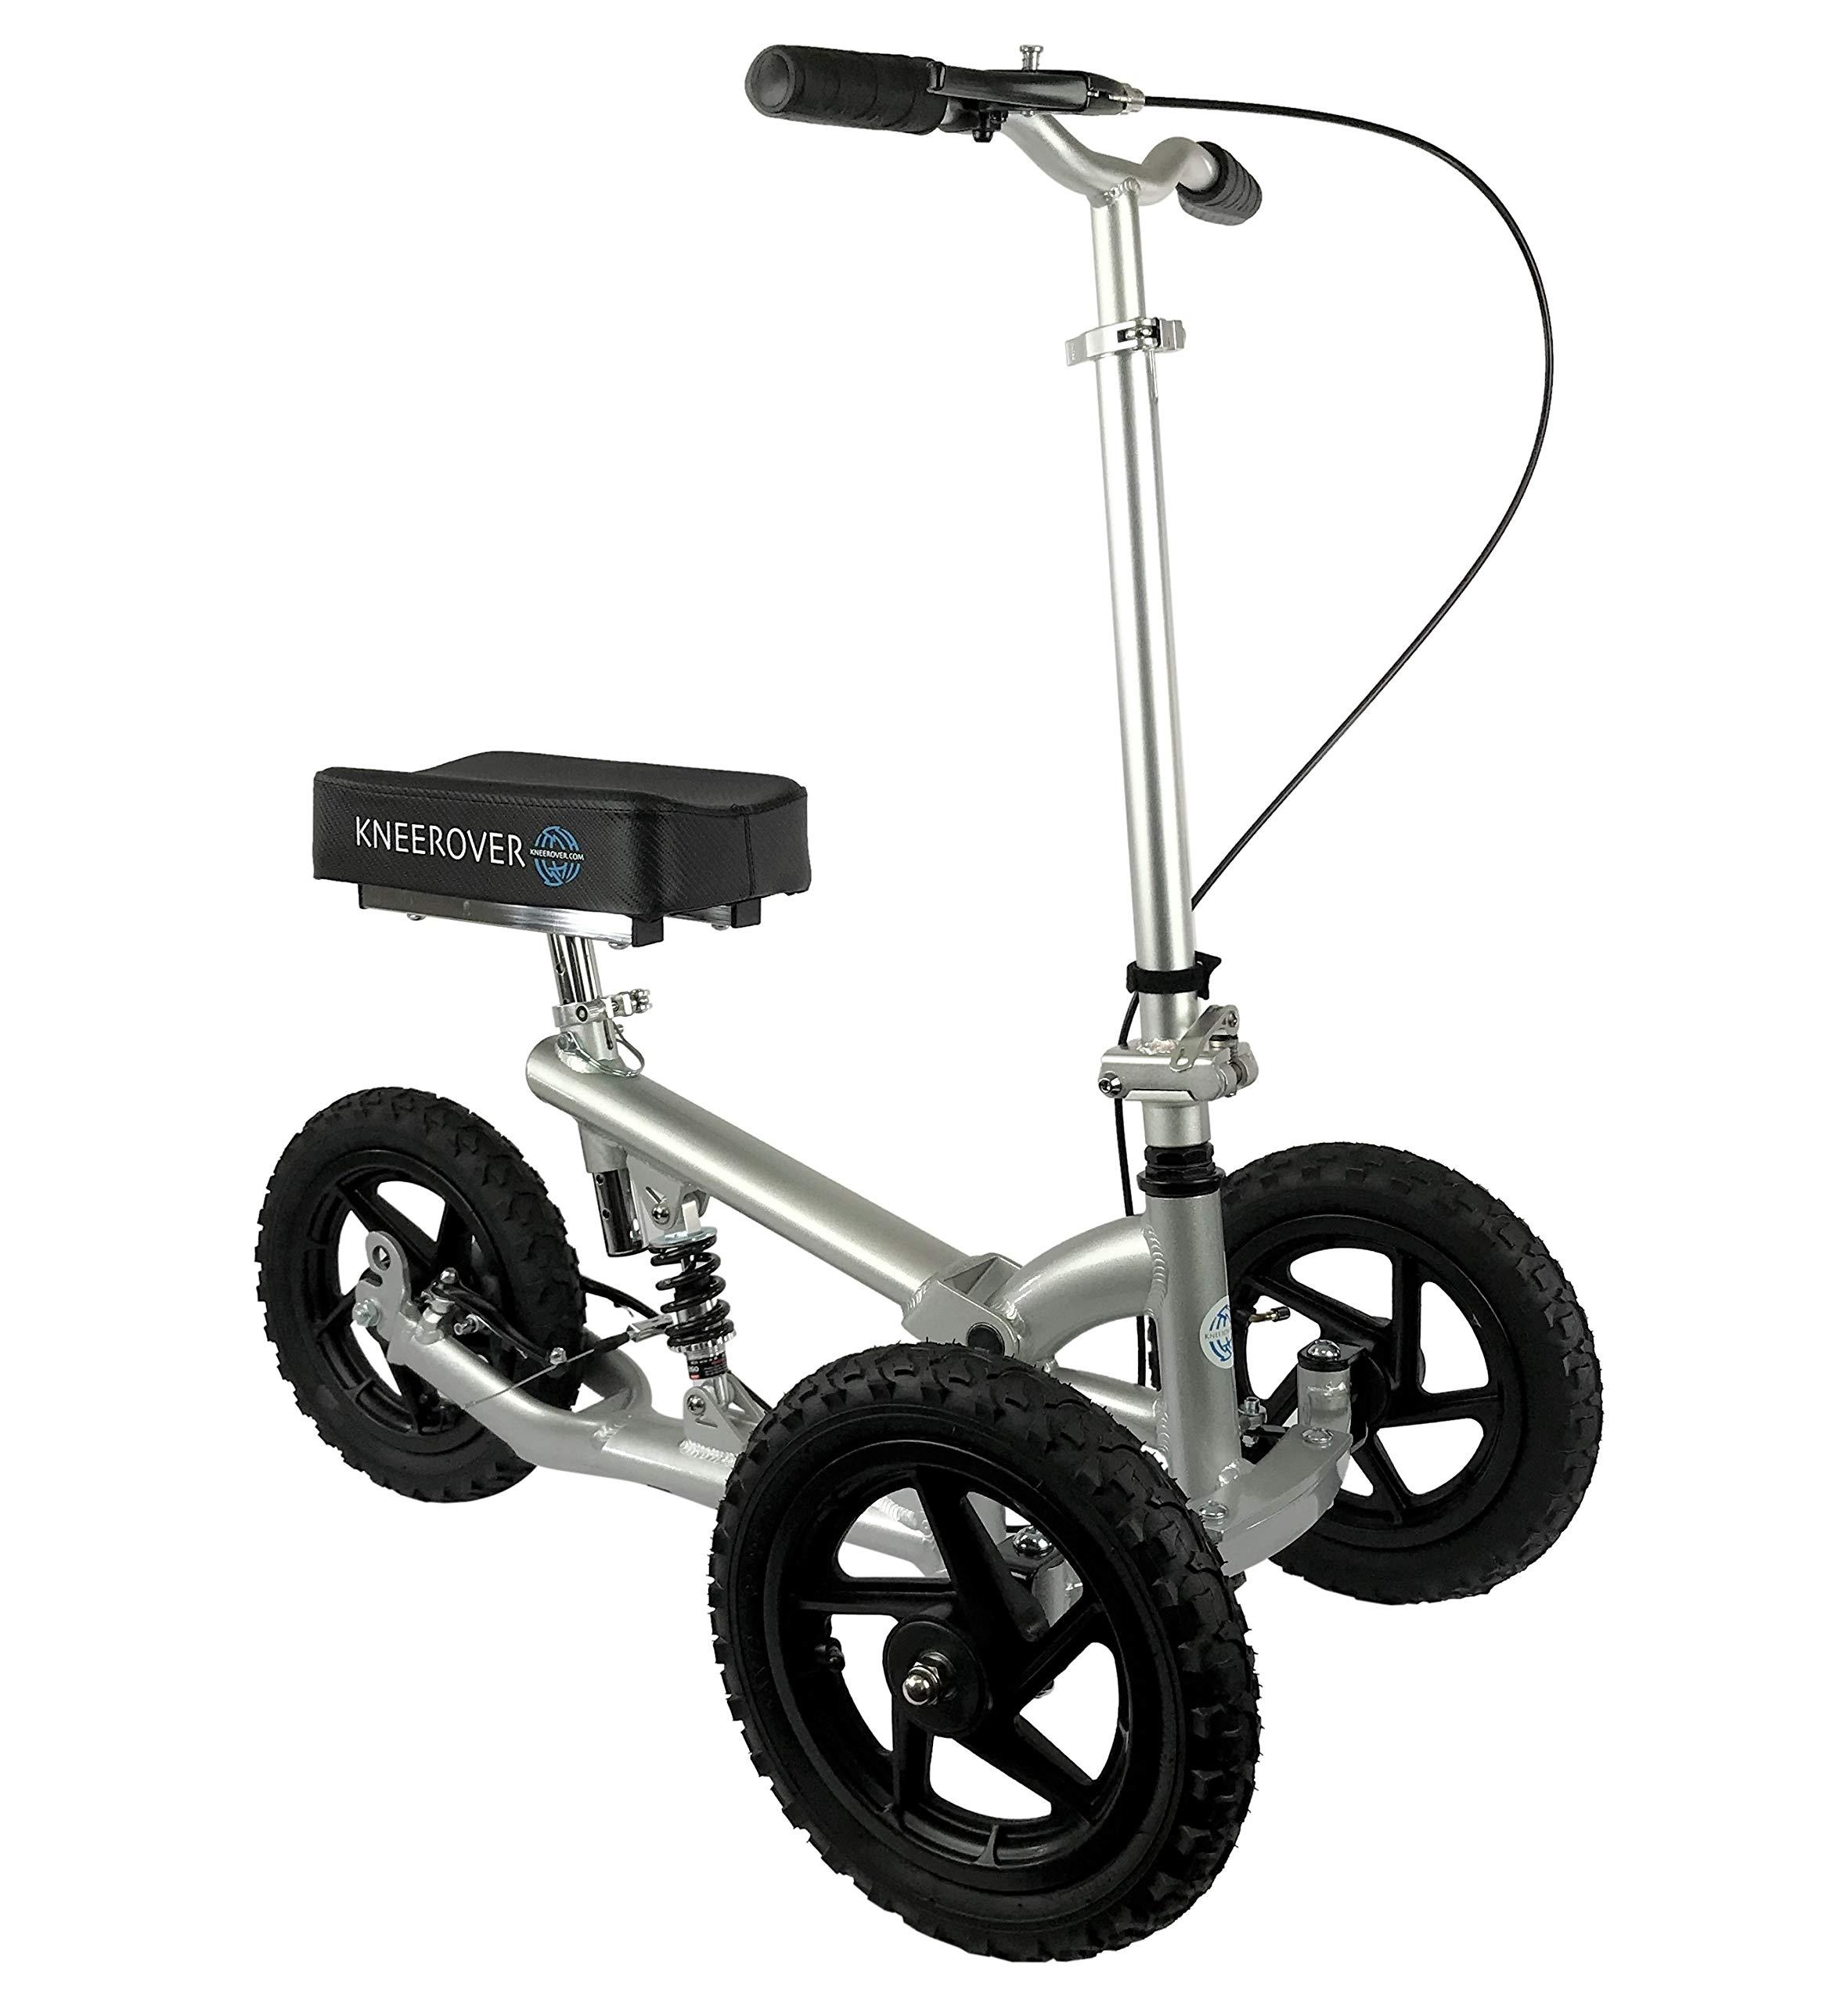 KneeRover PRO All Terrain Knee Walker Aluminum Scooter with Shock Absorber - Silver by KneeRover